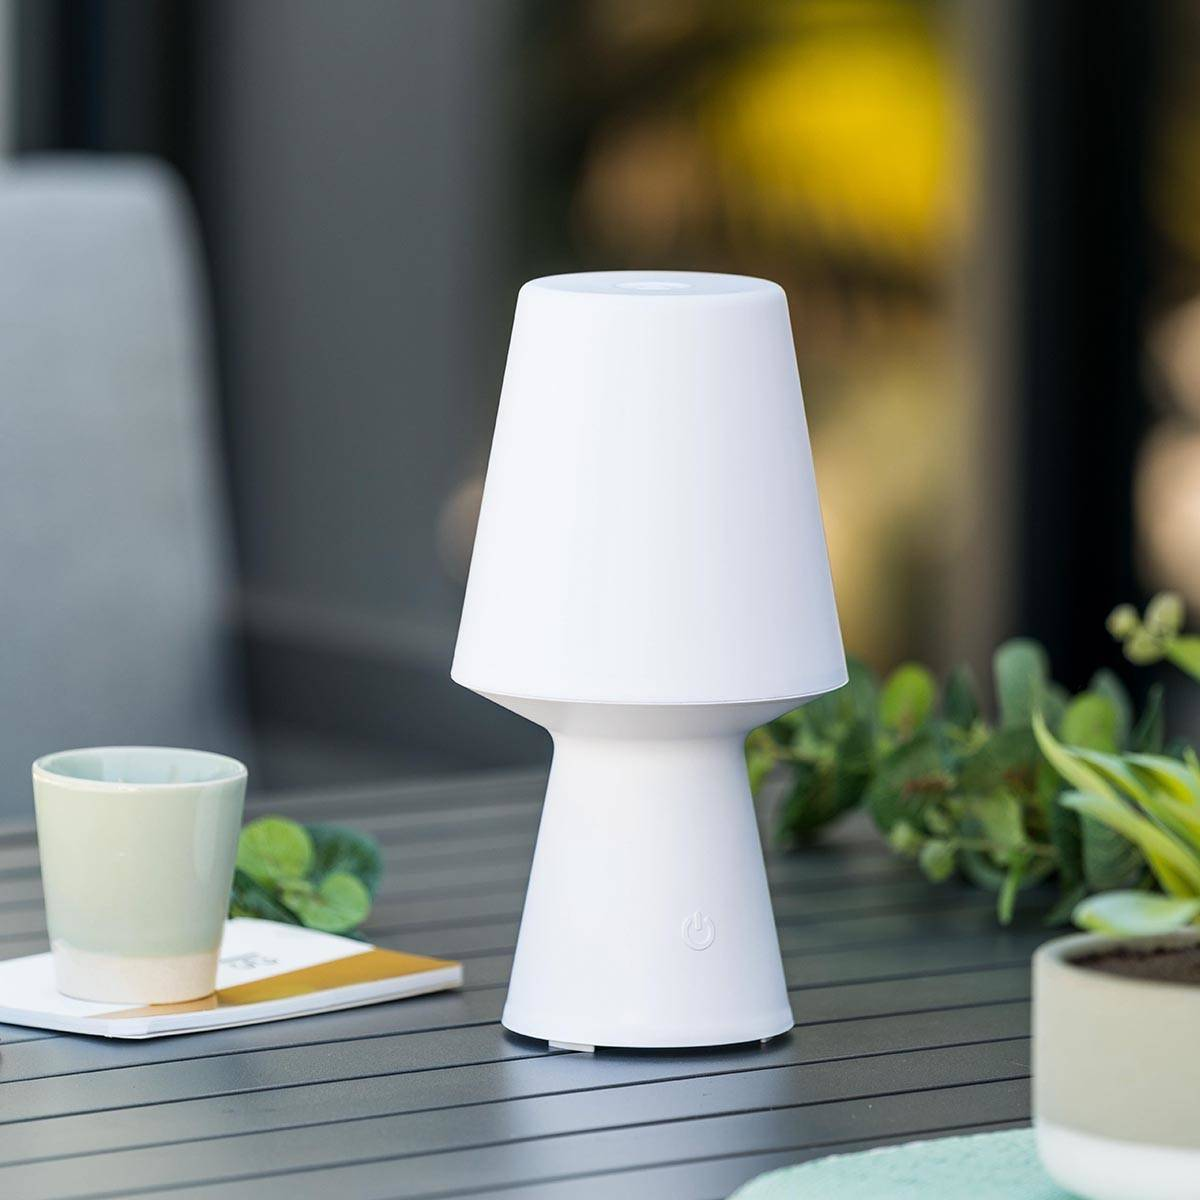 ATMOSPHERA Lampe nomade LED d'extérieur blanche Wiza Jardin H.23 cm